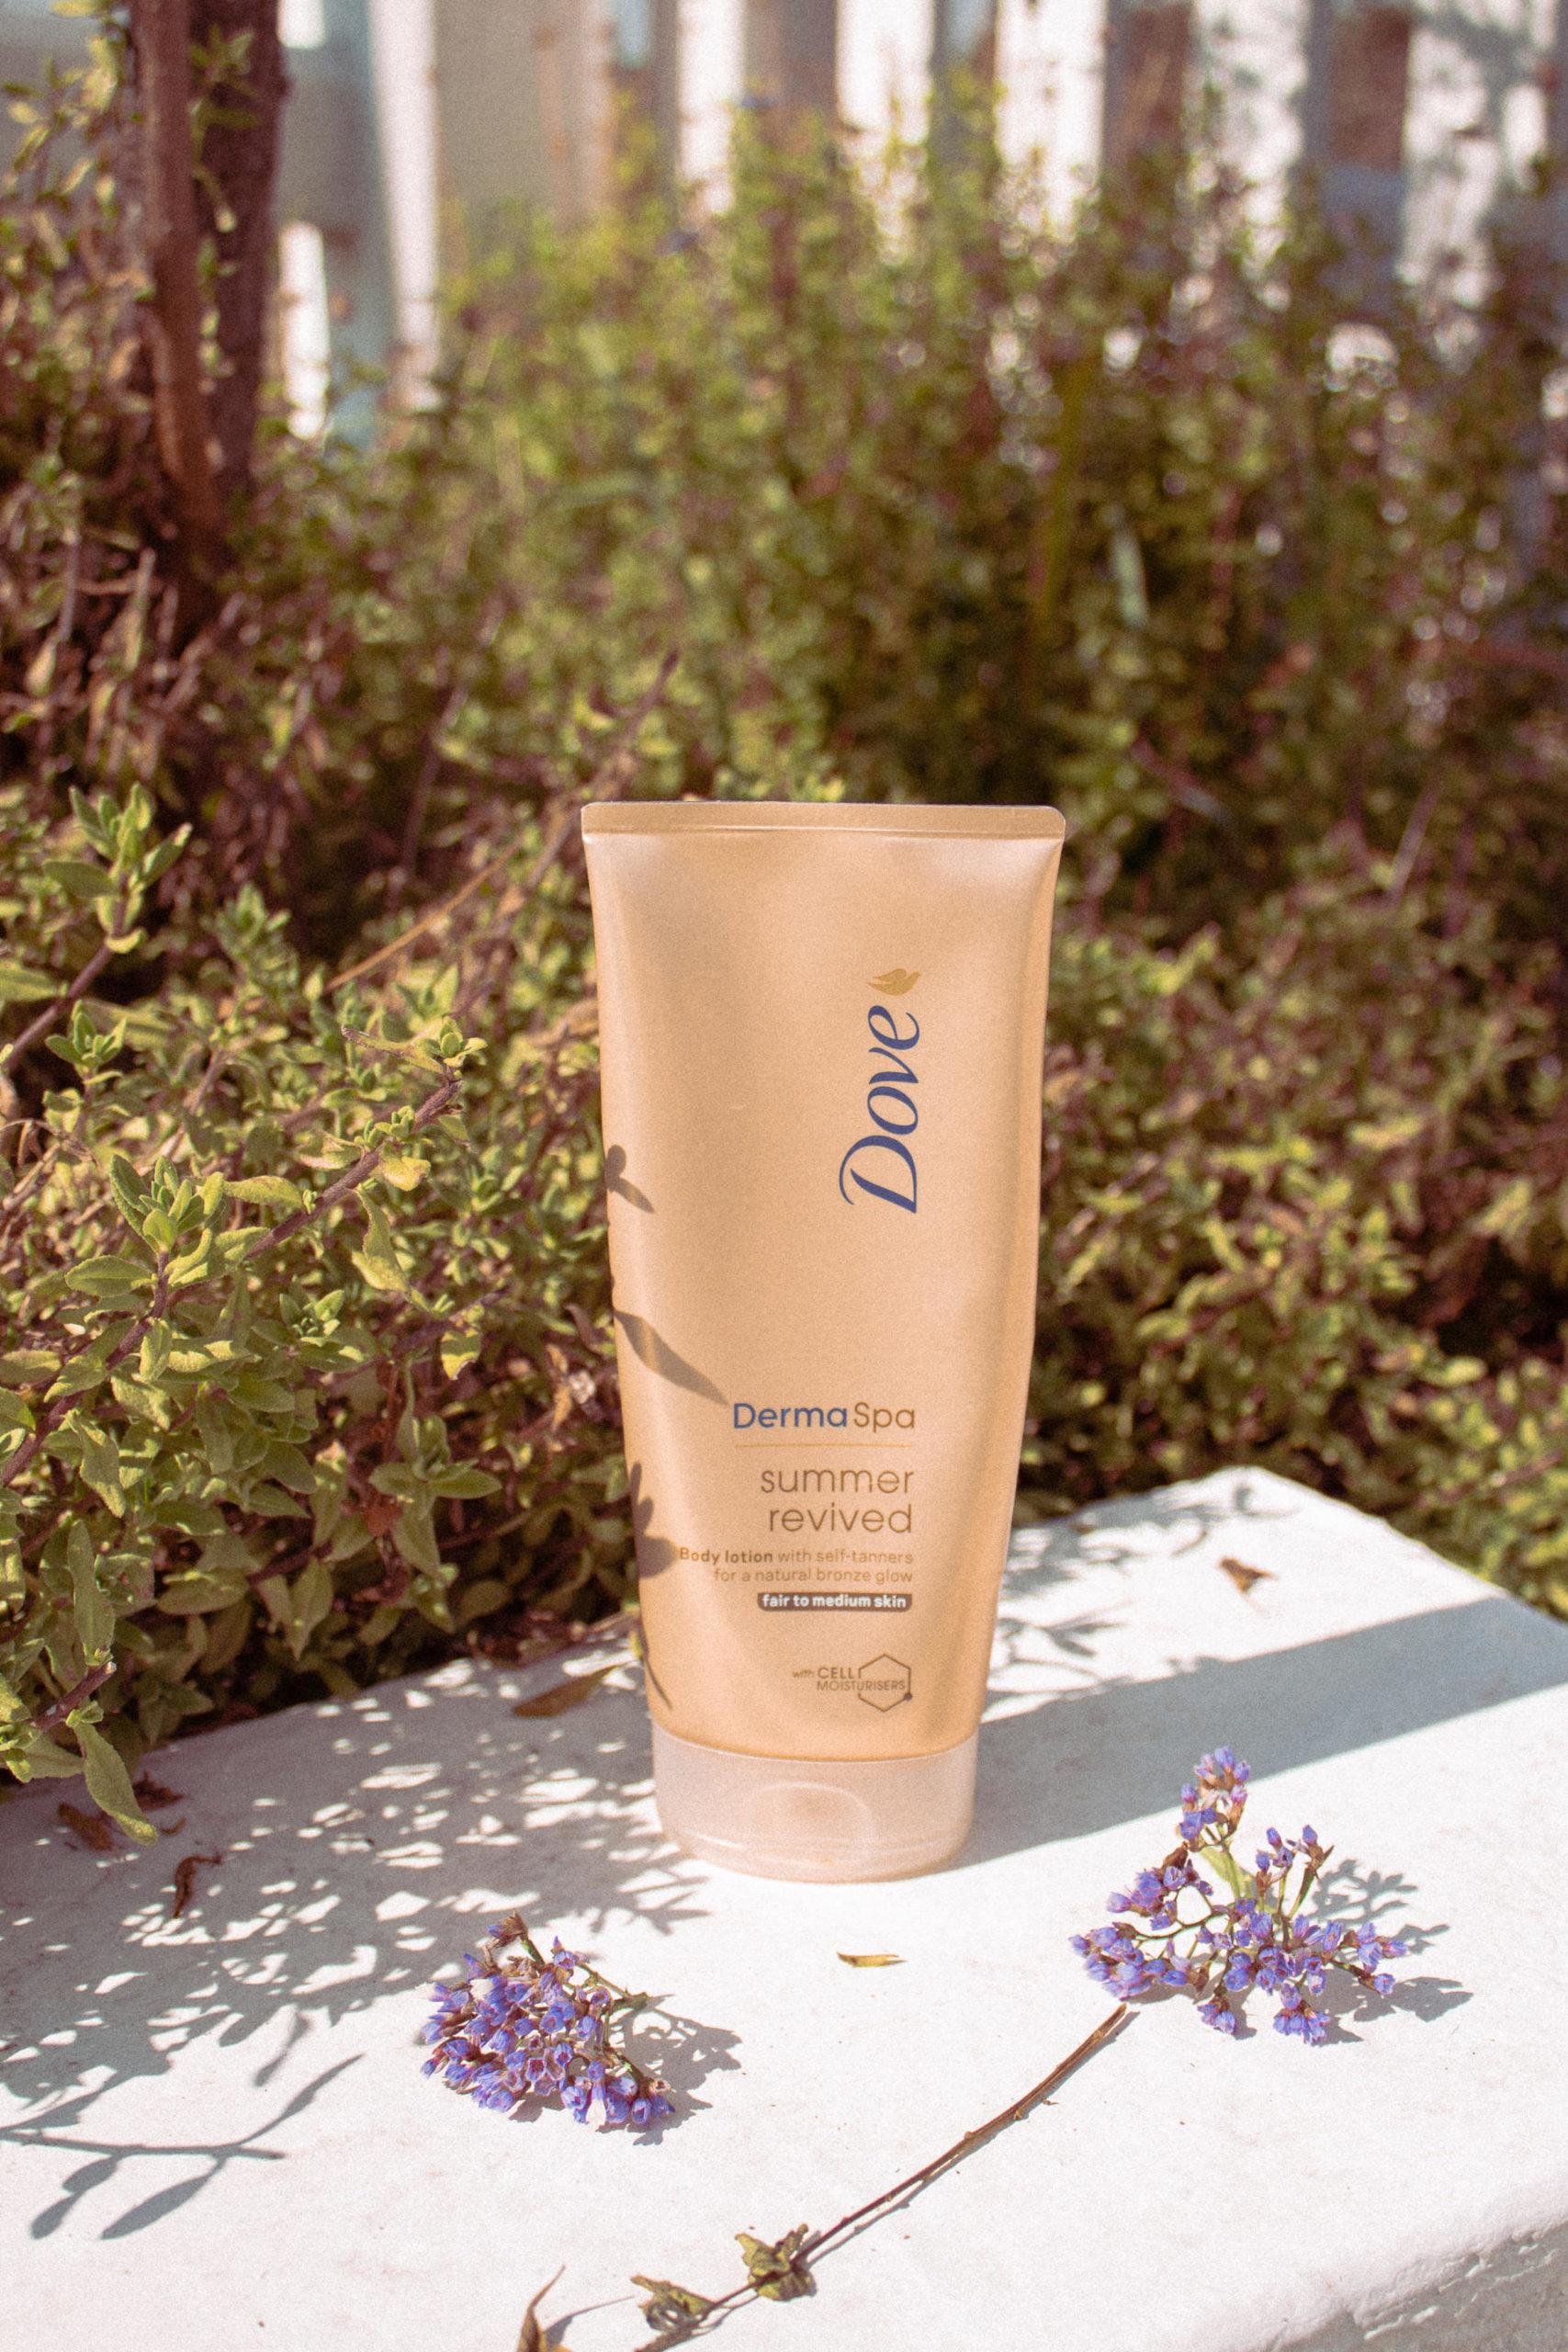 Body cream product in garden